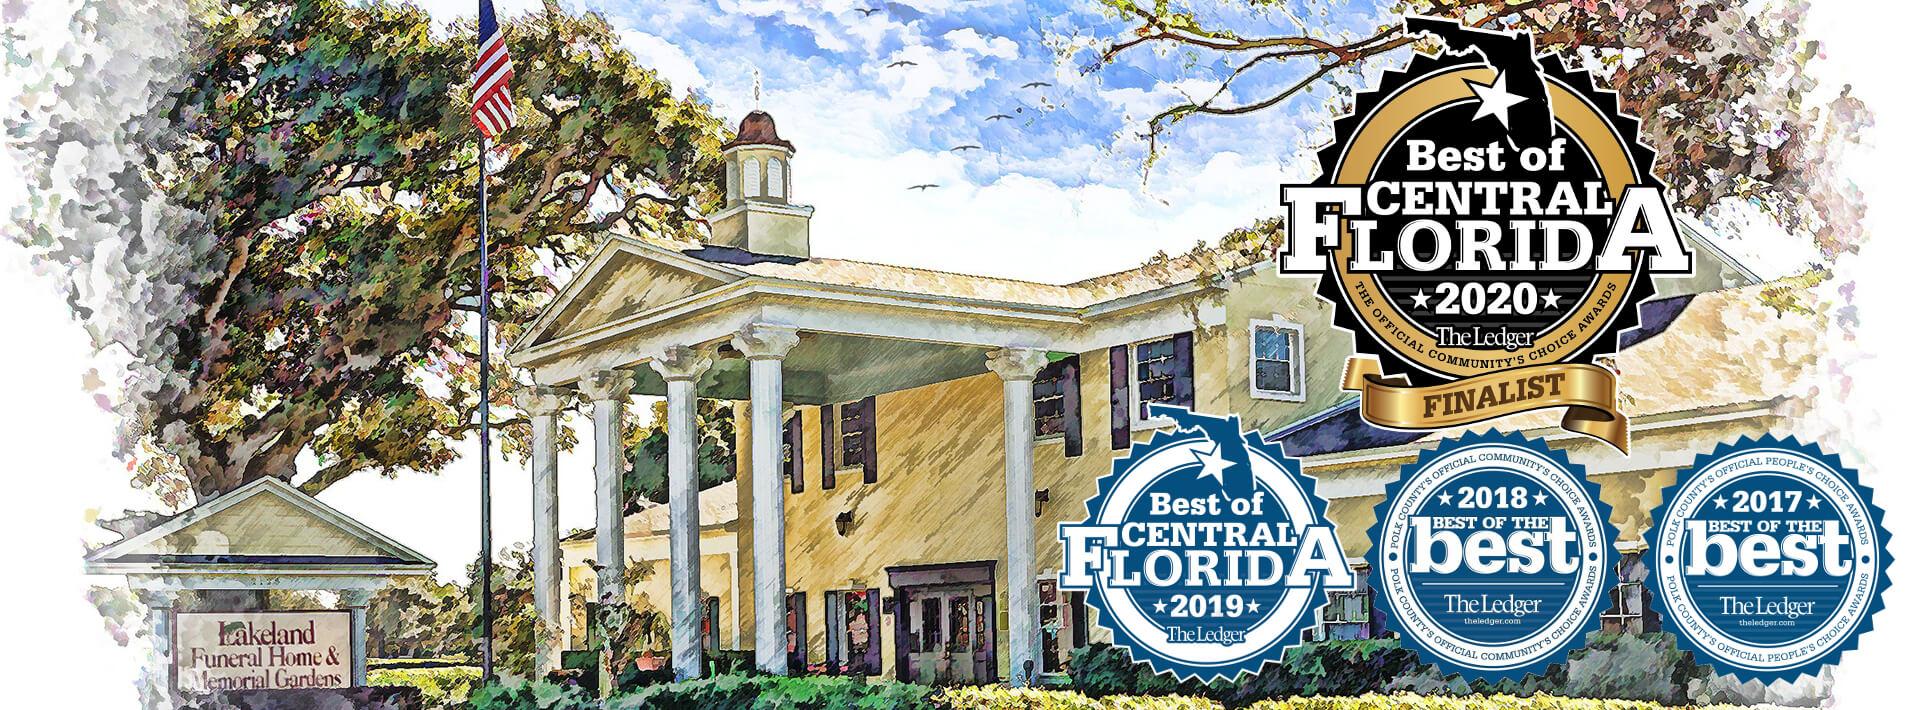 Lakeland Funeral Home in Lakeland, FL